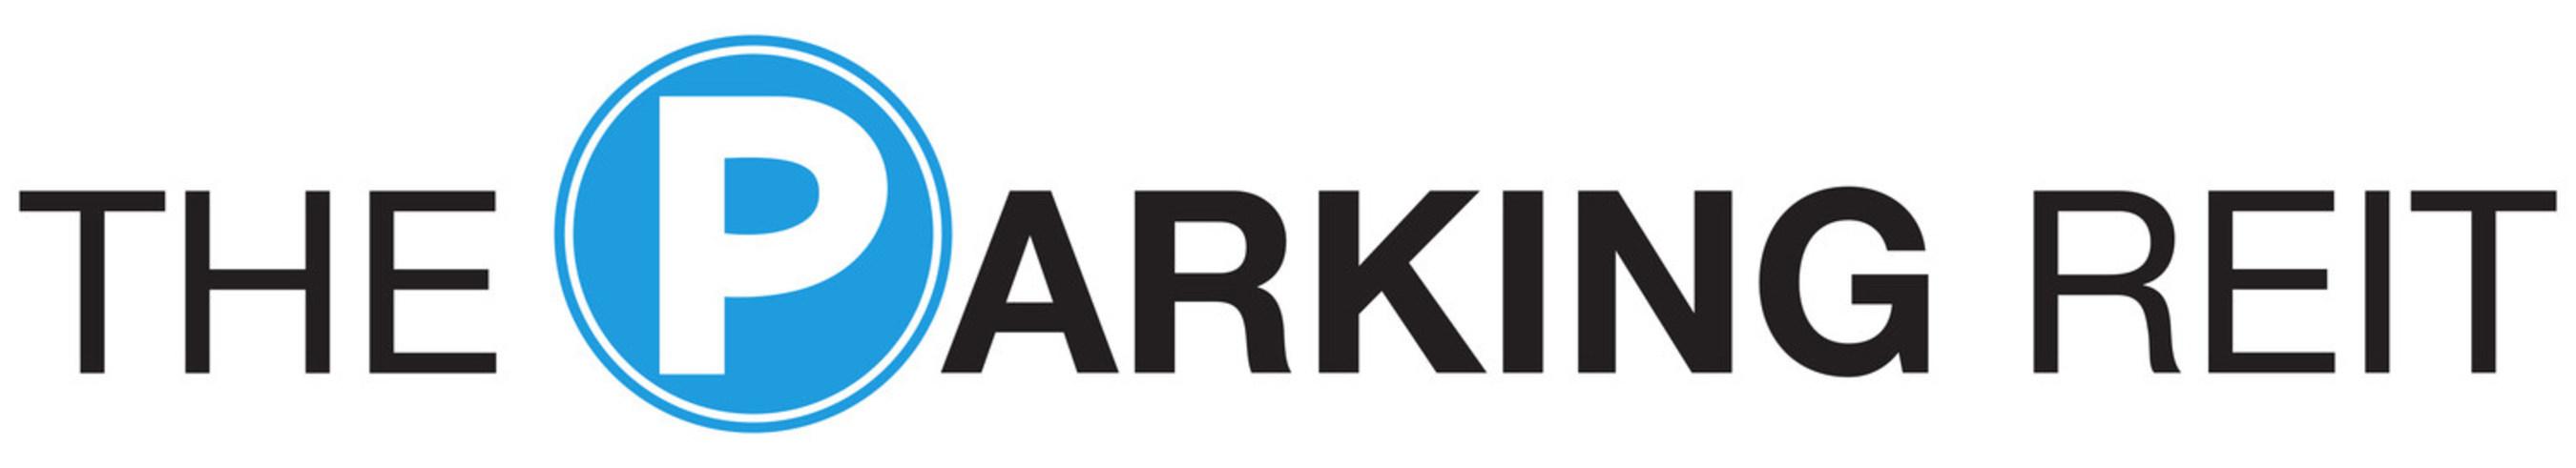 The Parking REIT logo